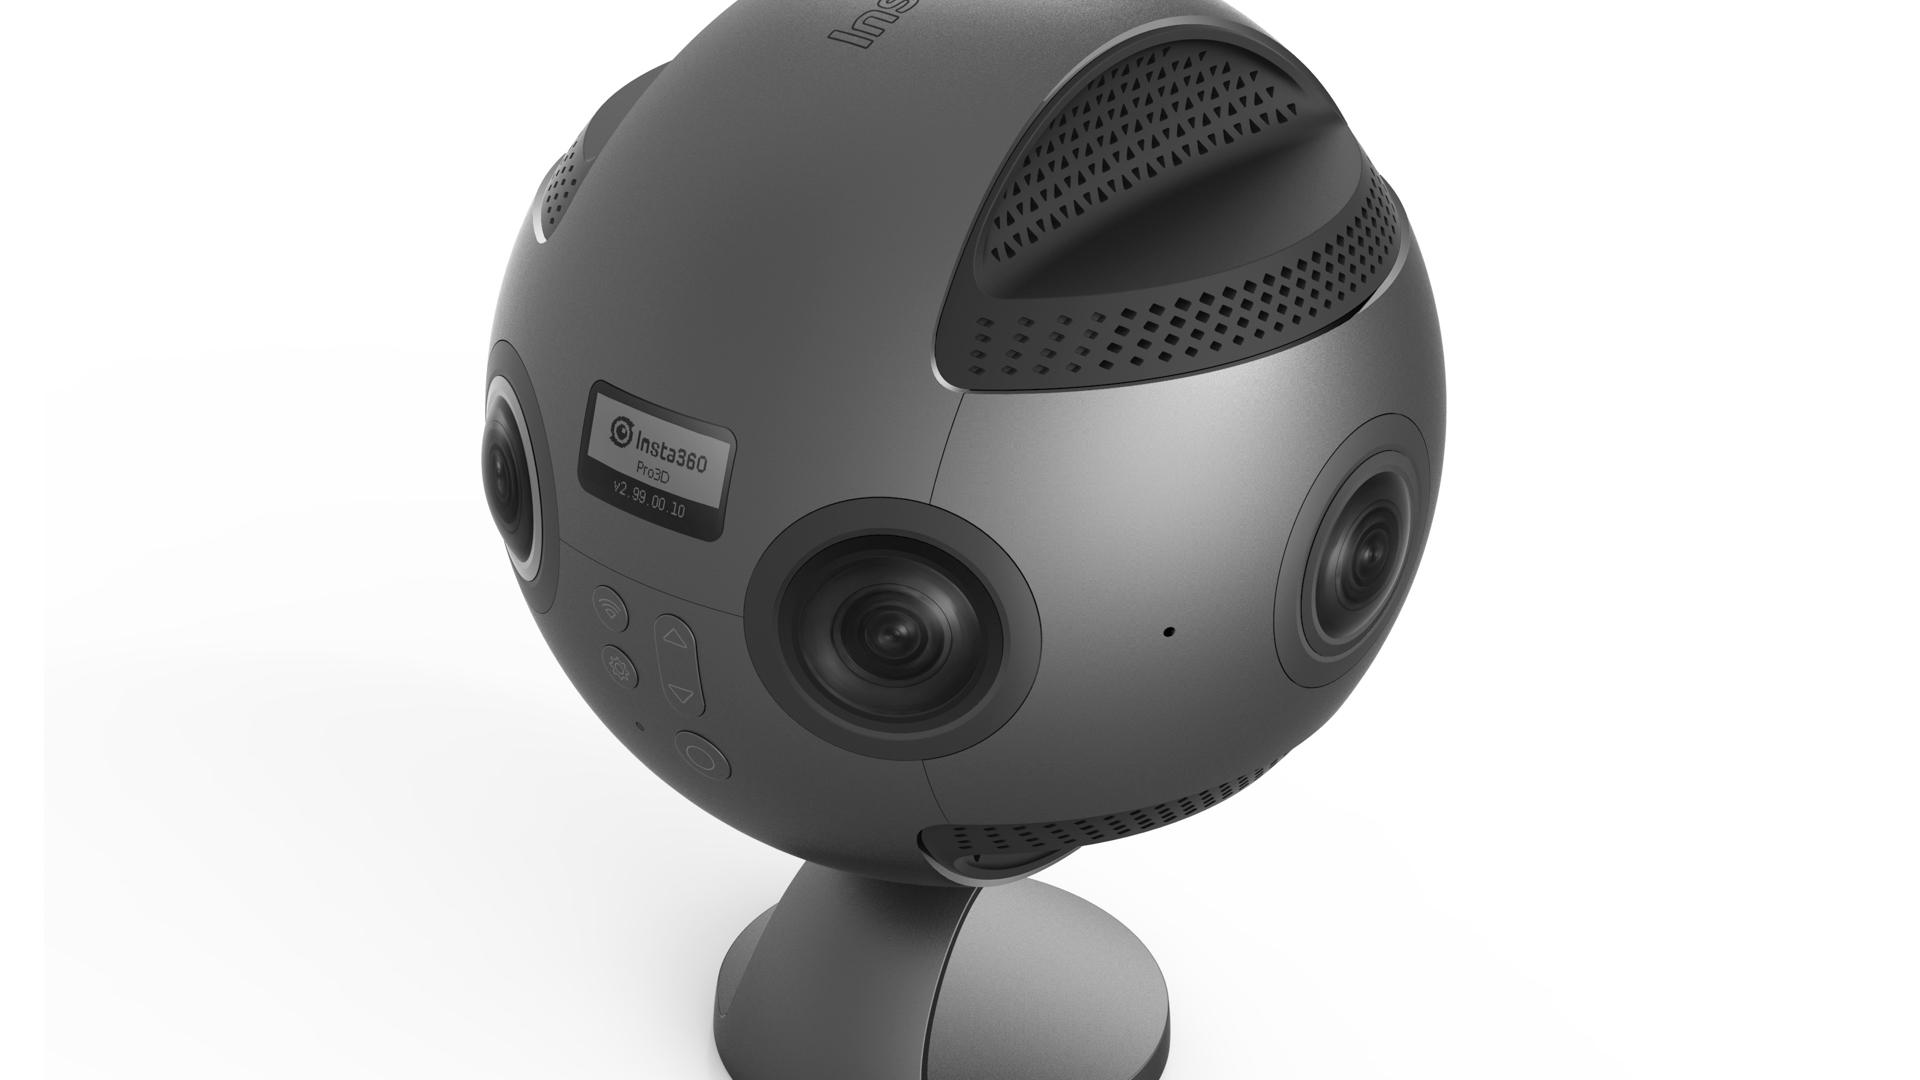 Insta360 ProファームウェアV2.0 - 画質改善やマニュアルフレームレート設定を追加